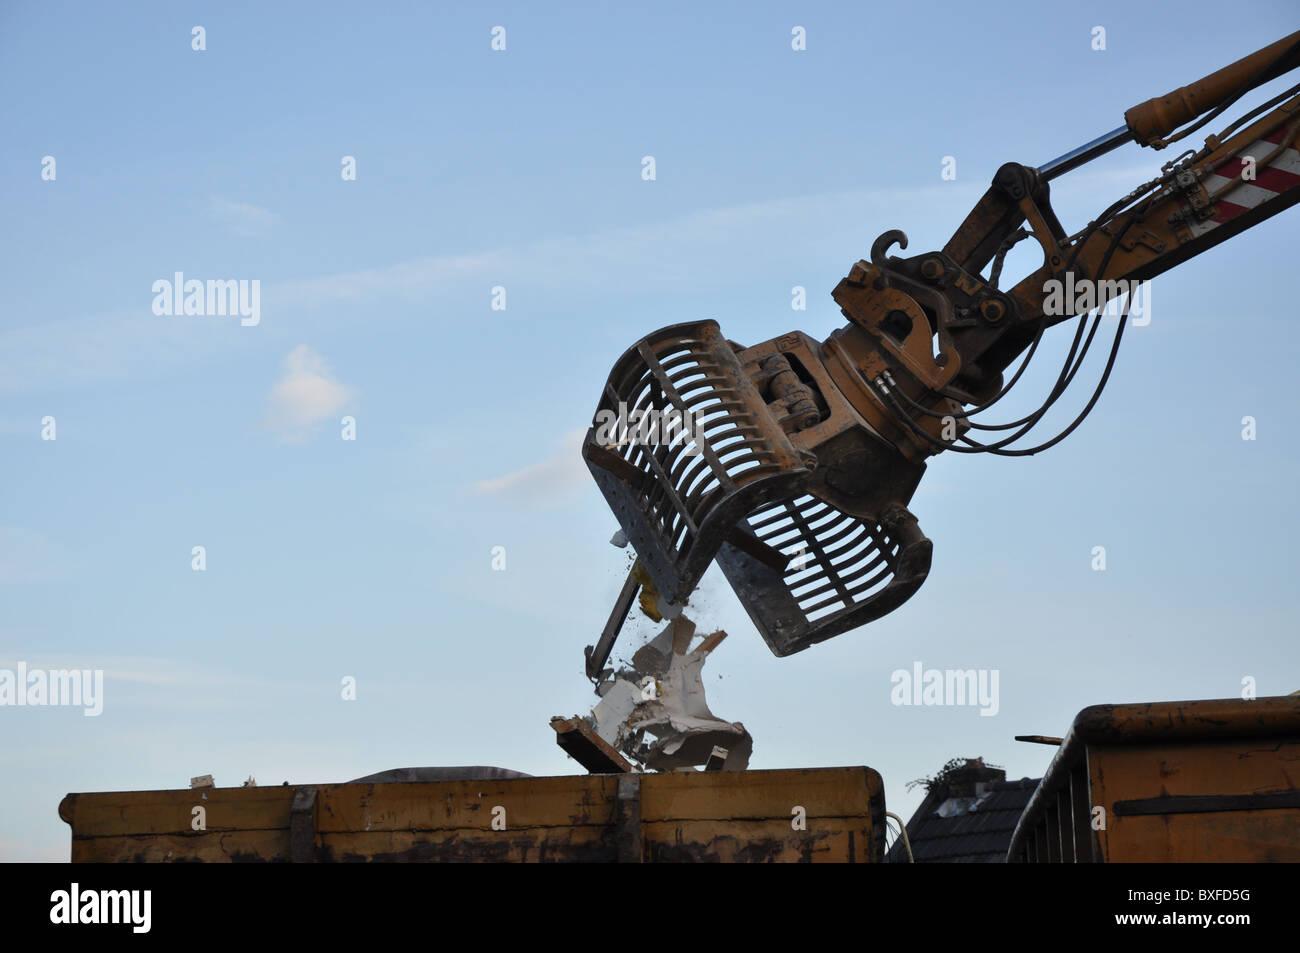 Crane lifting debri - Stock Image